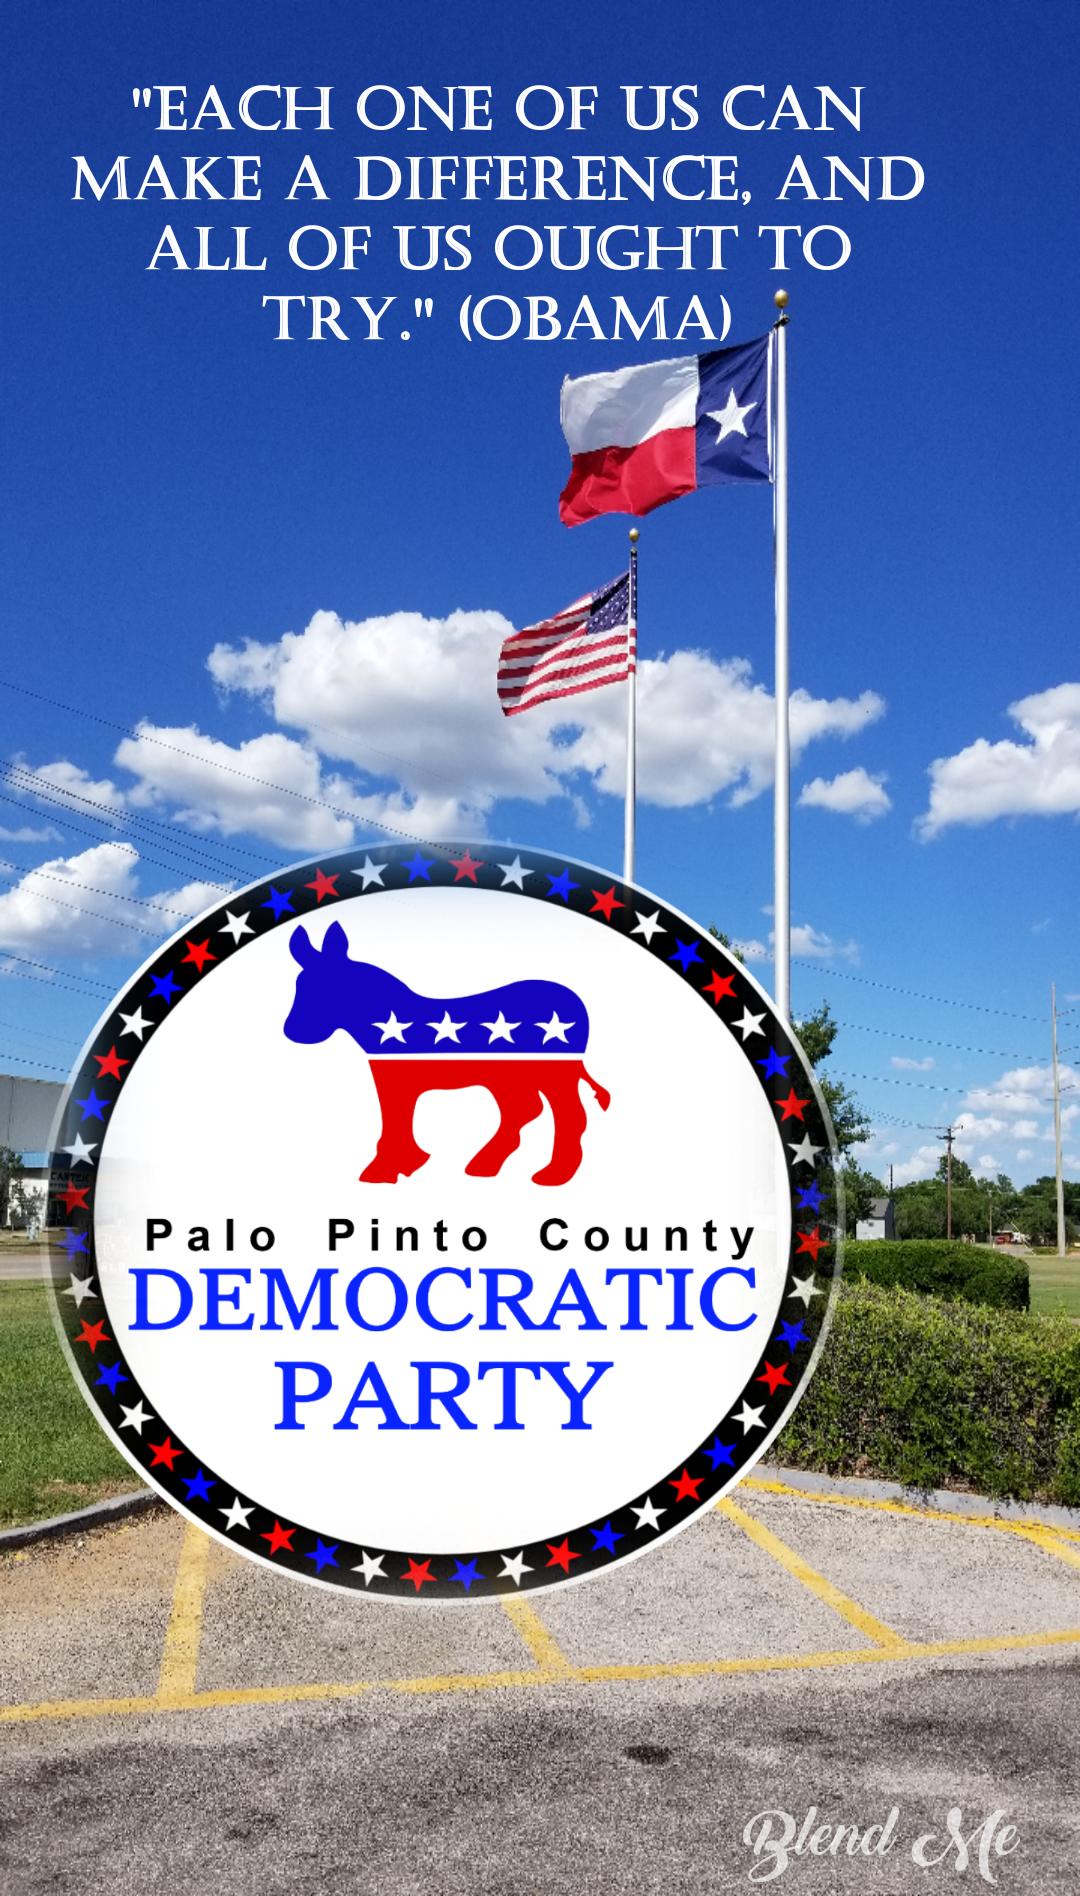 Palo Pinto County Democratic Party (TX)